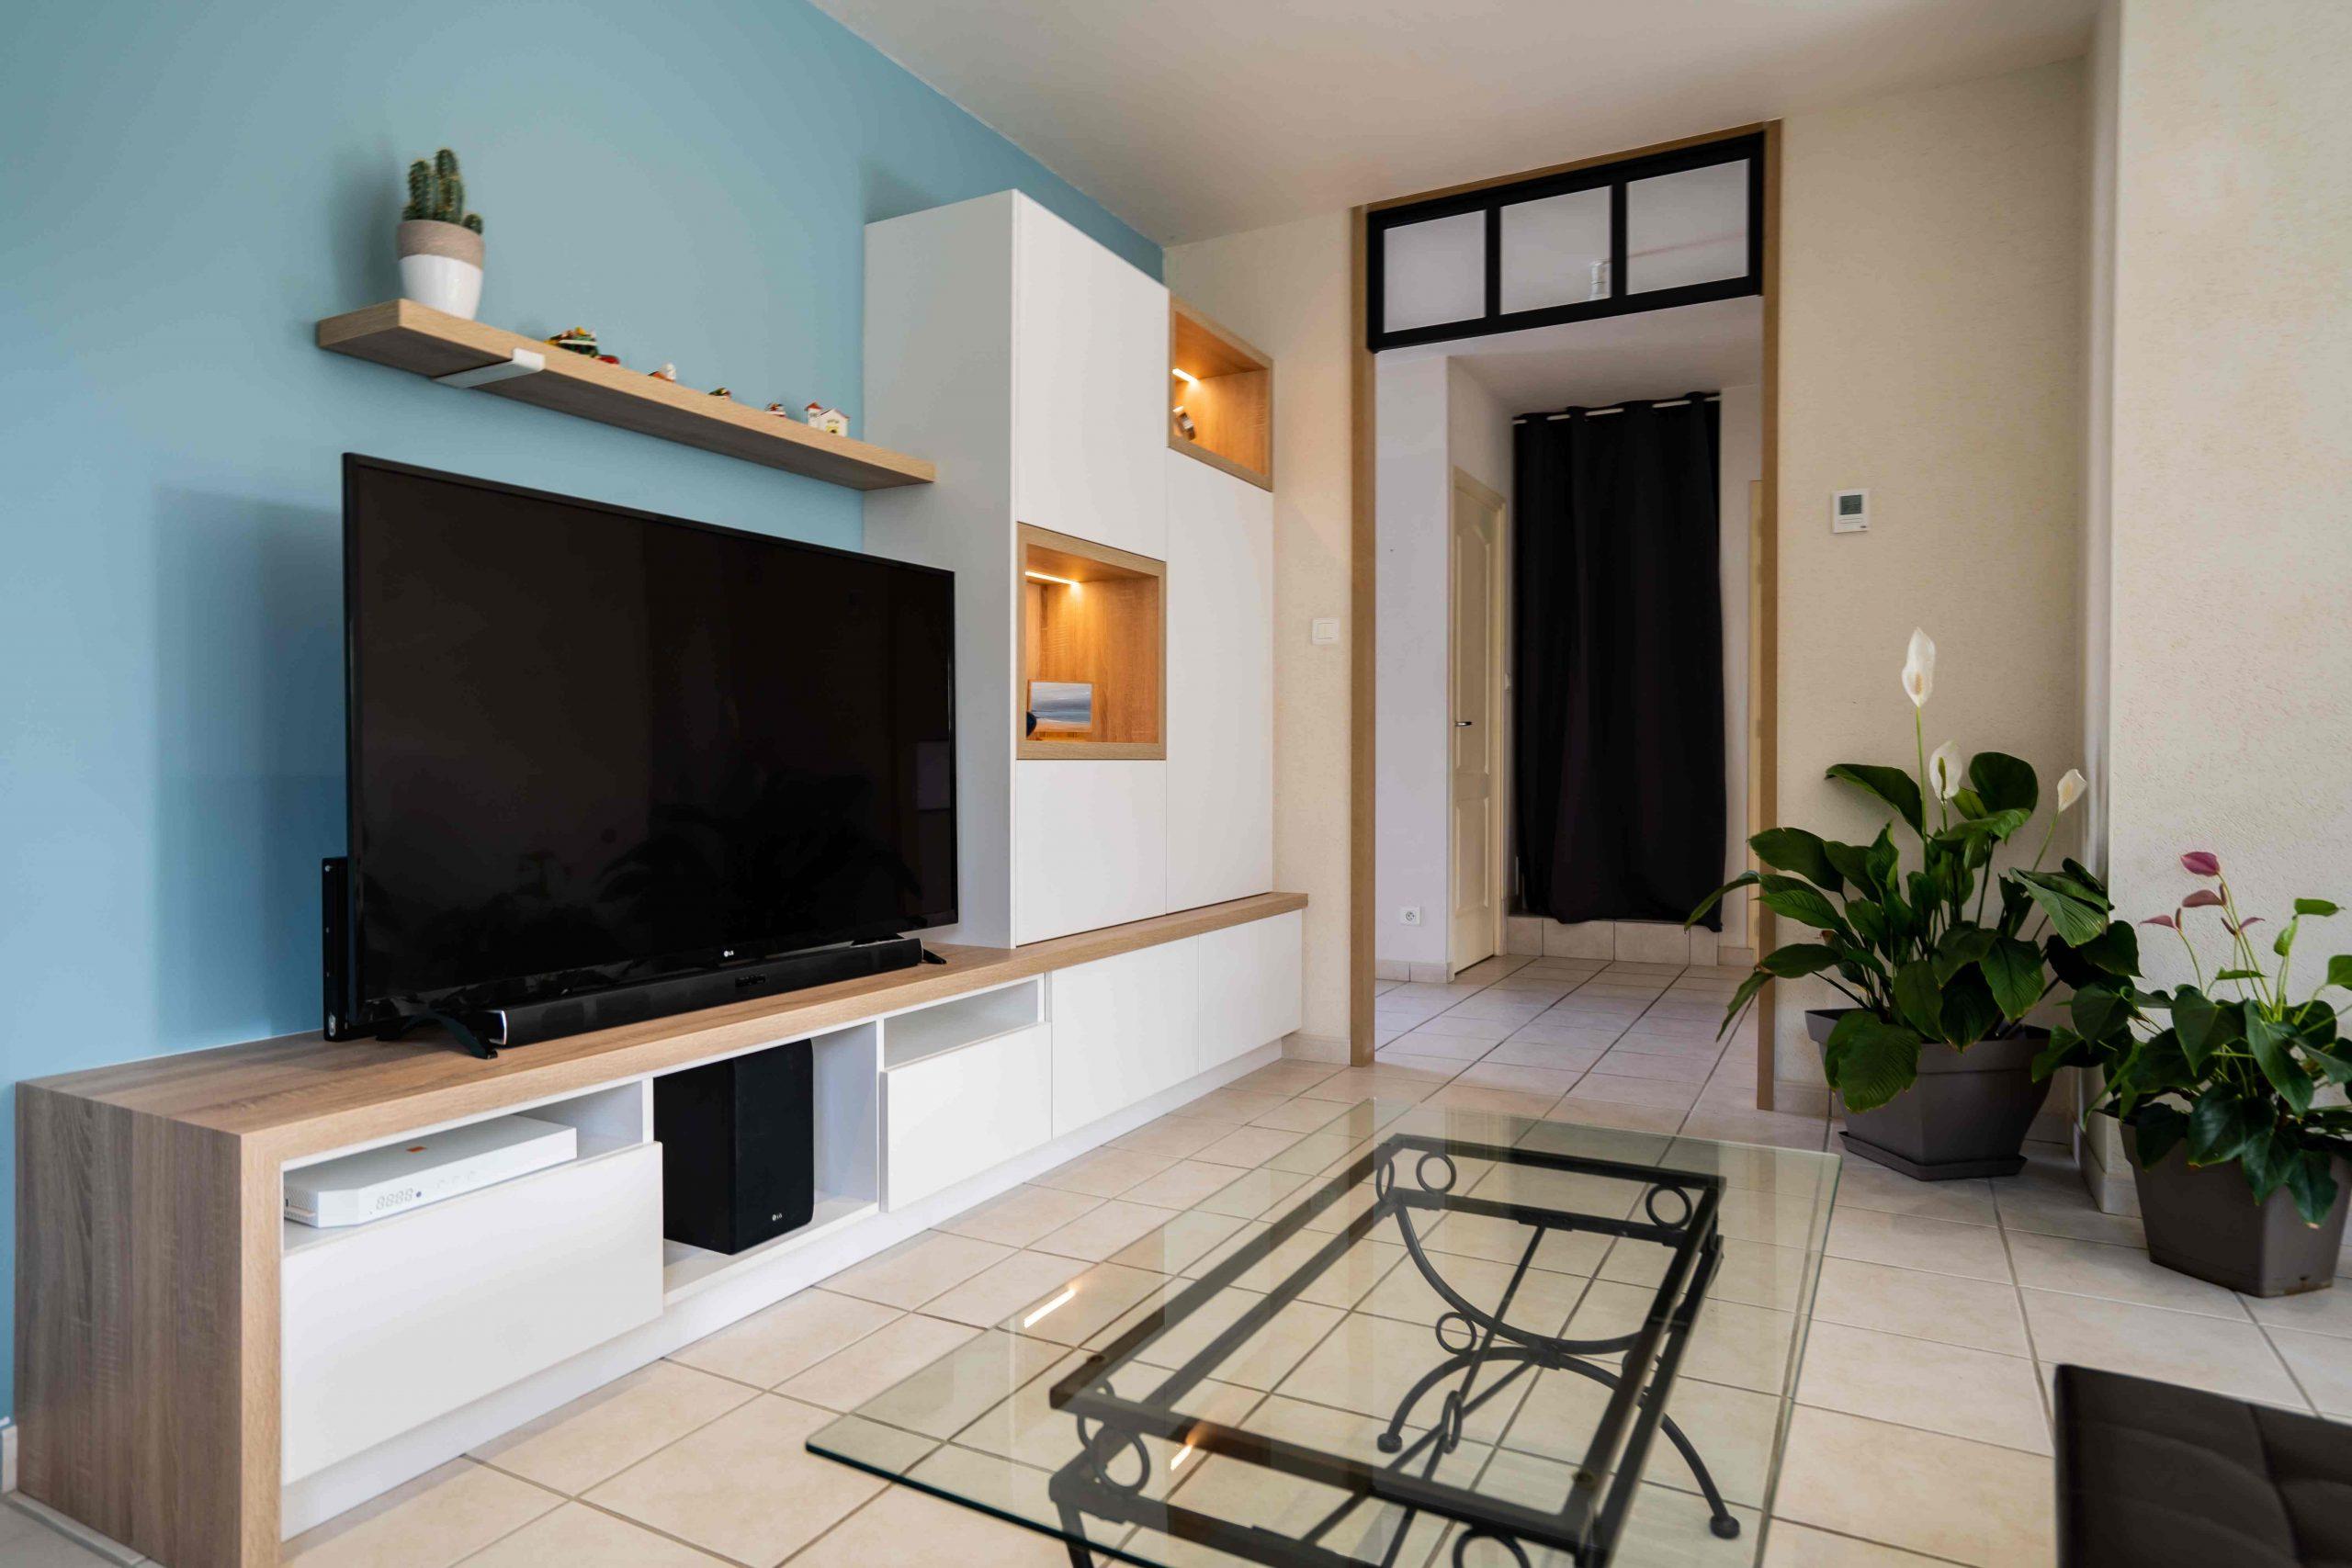 RDI01375 scaled - Meuble TV sur mesure blanc & chêne